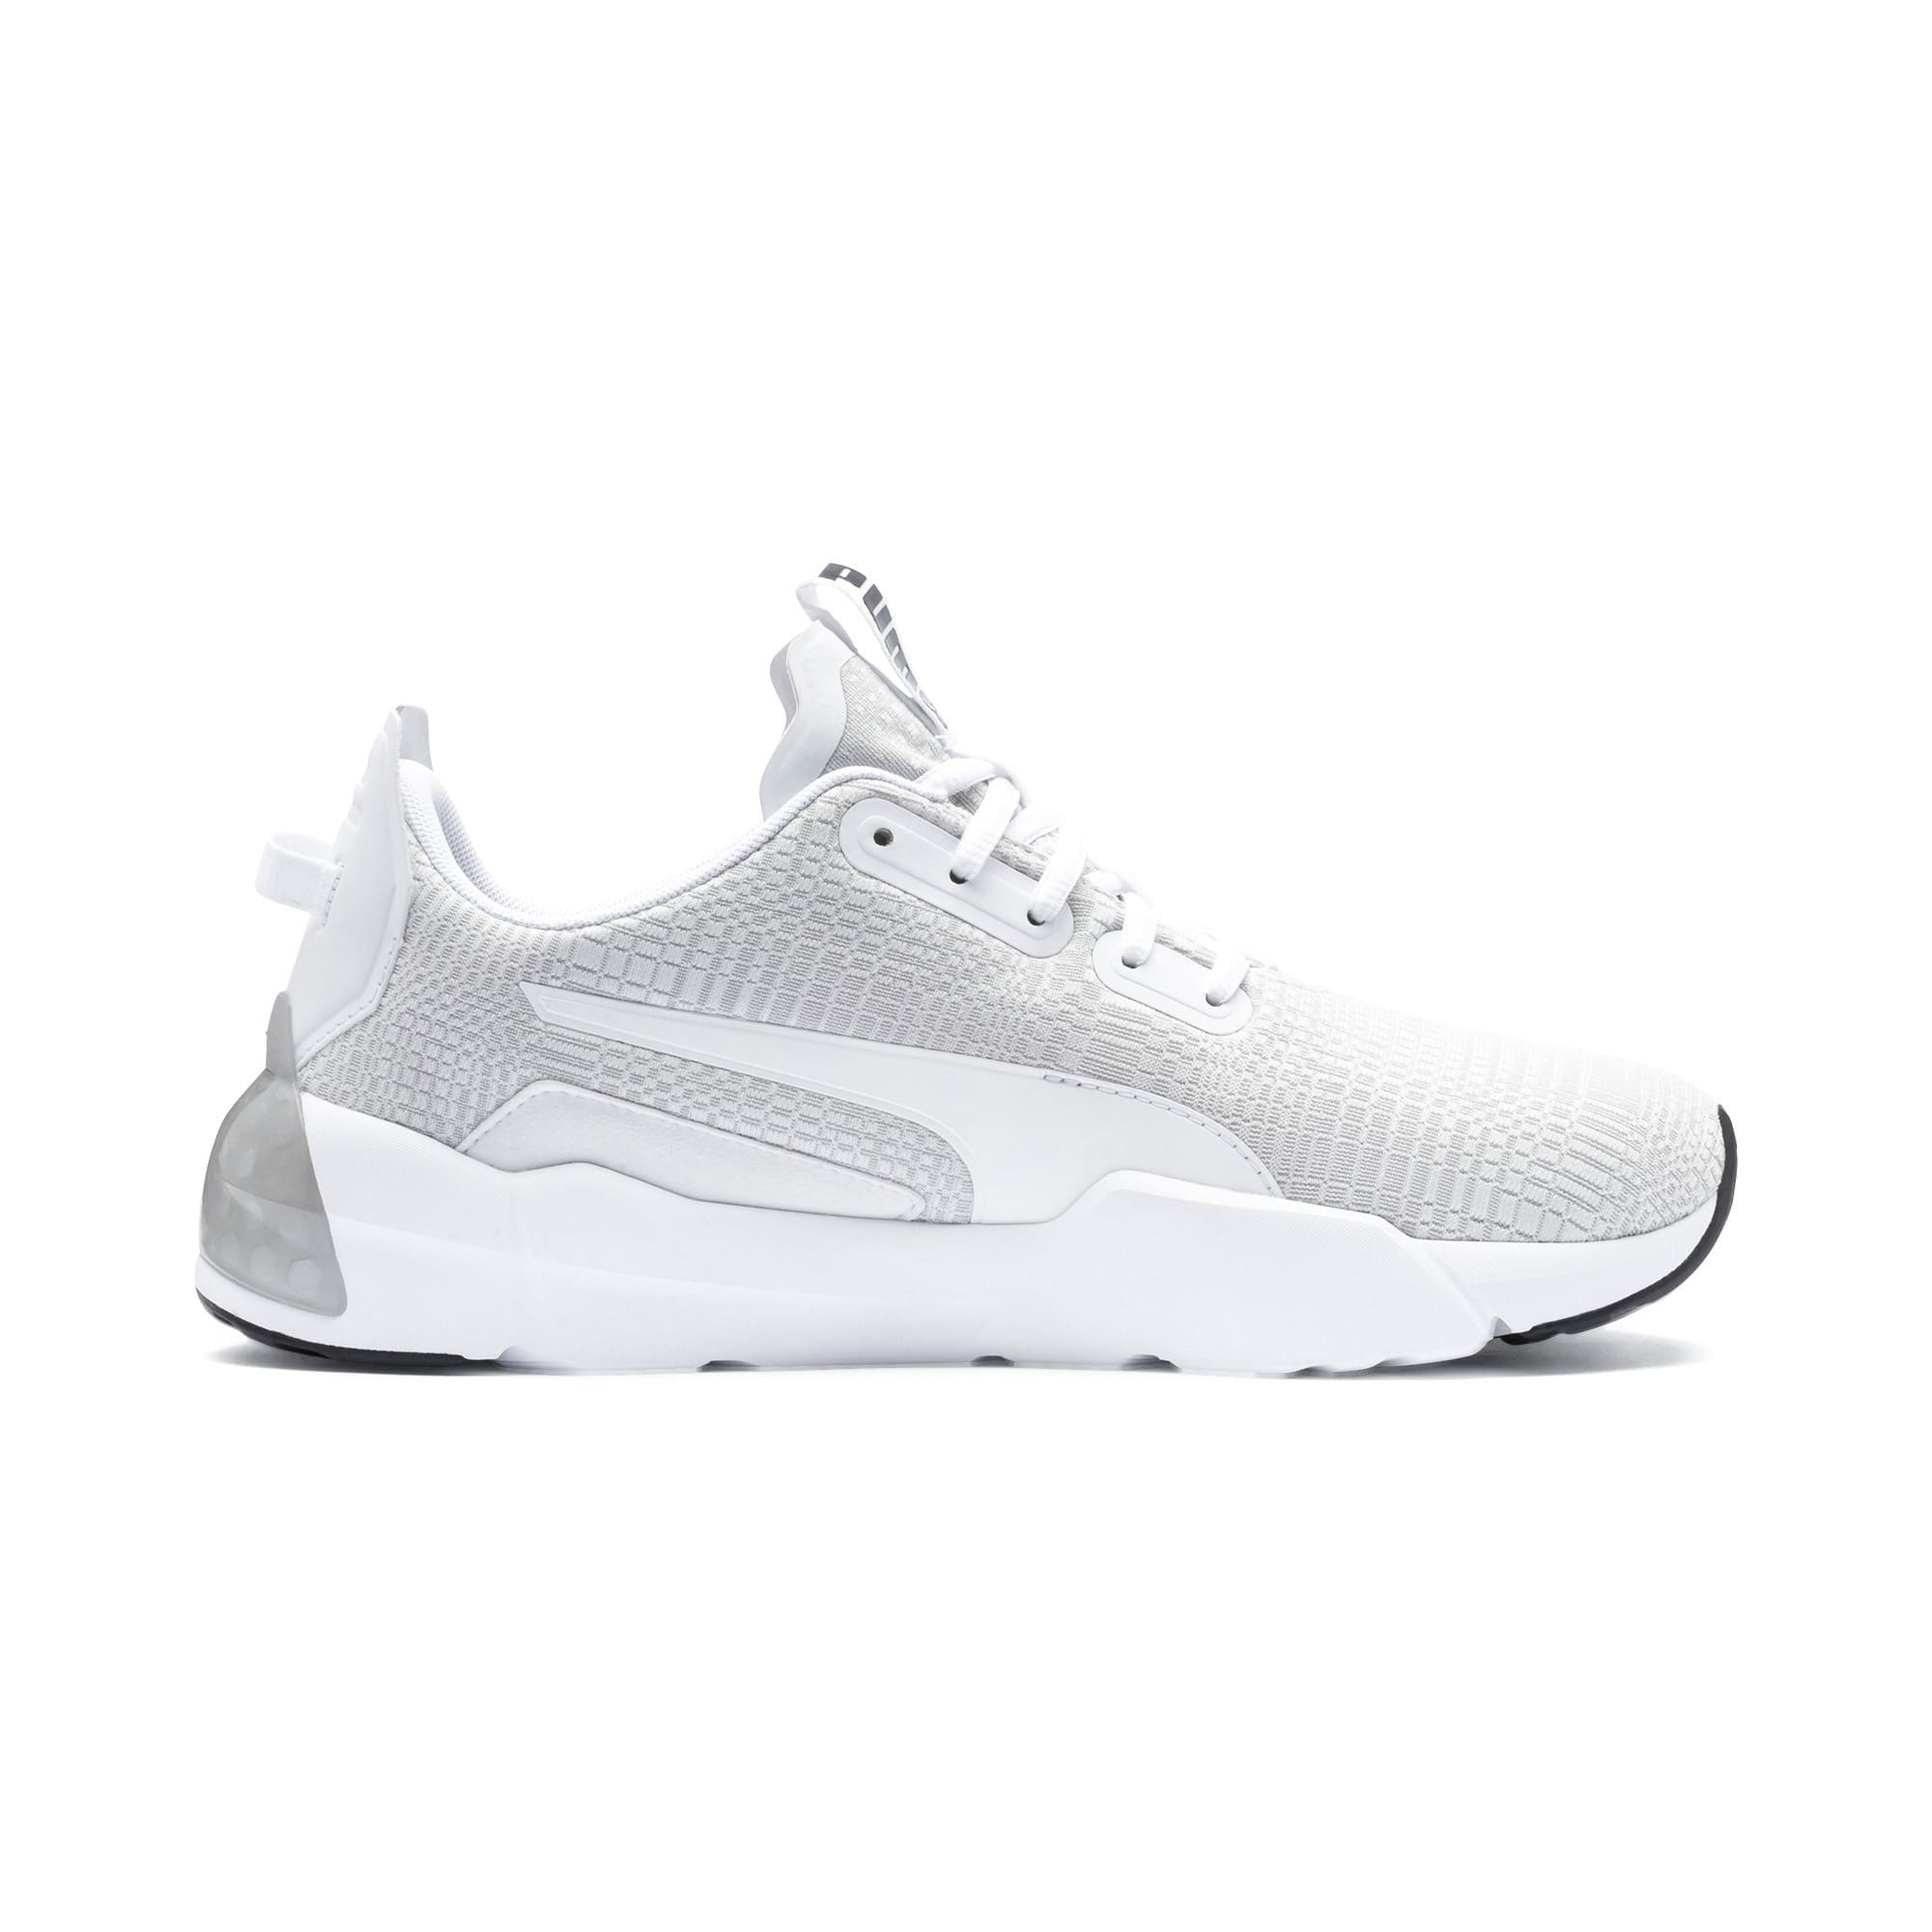 Thumbnail 6 of CELL Phase Lights Men's Training Shoes, Puma White-Gray Violet, medium